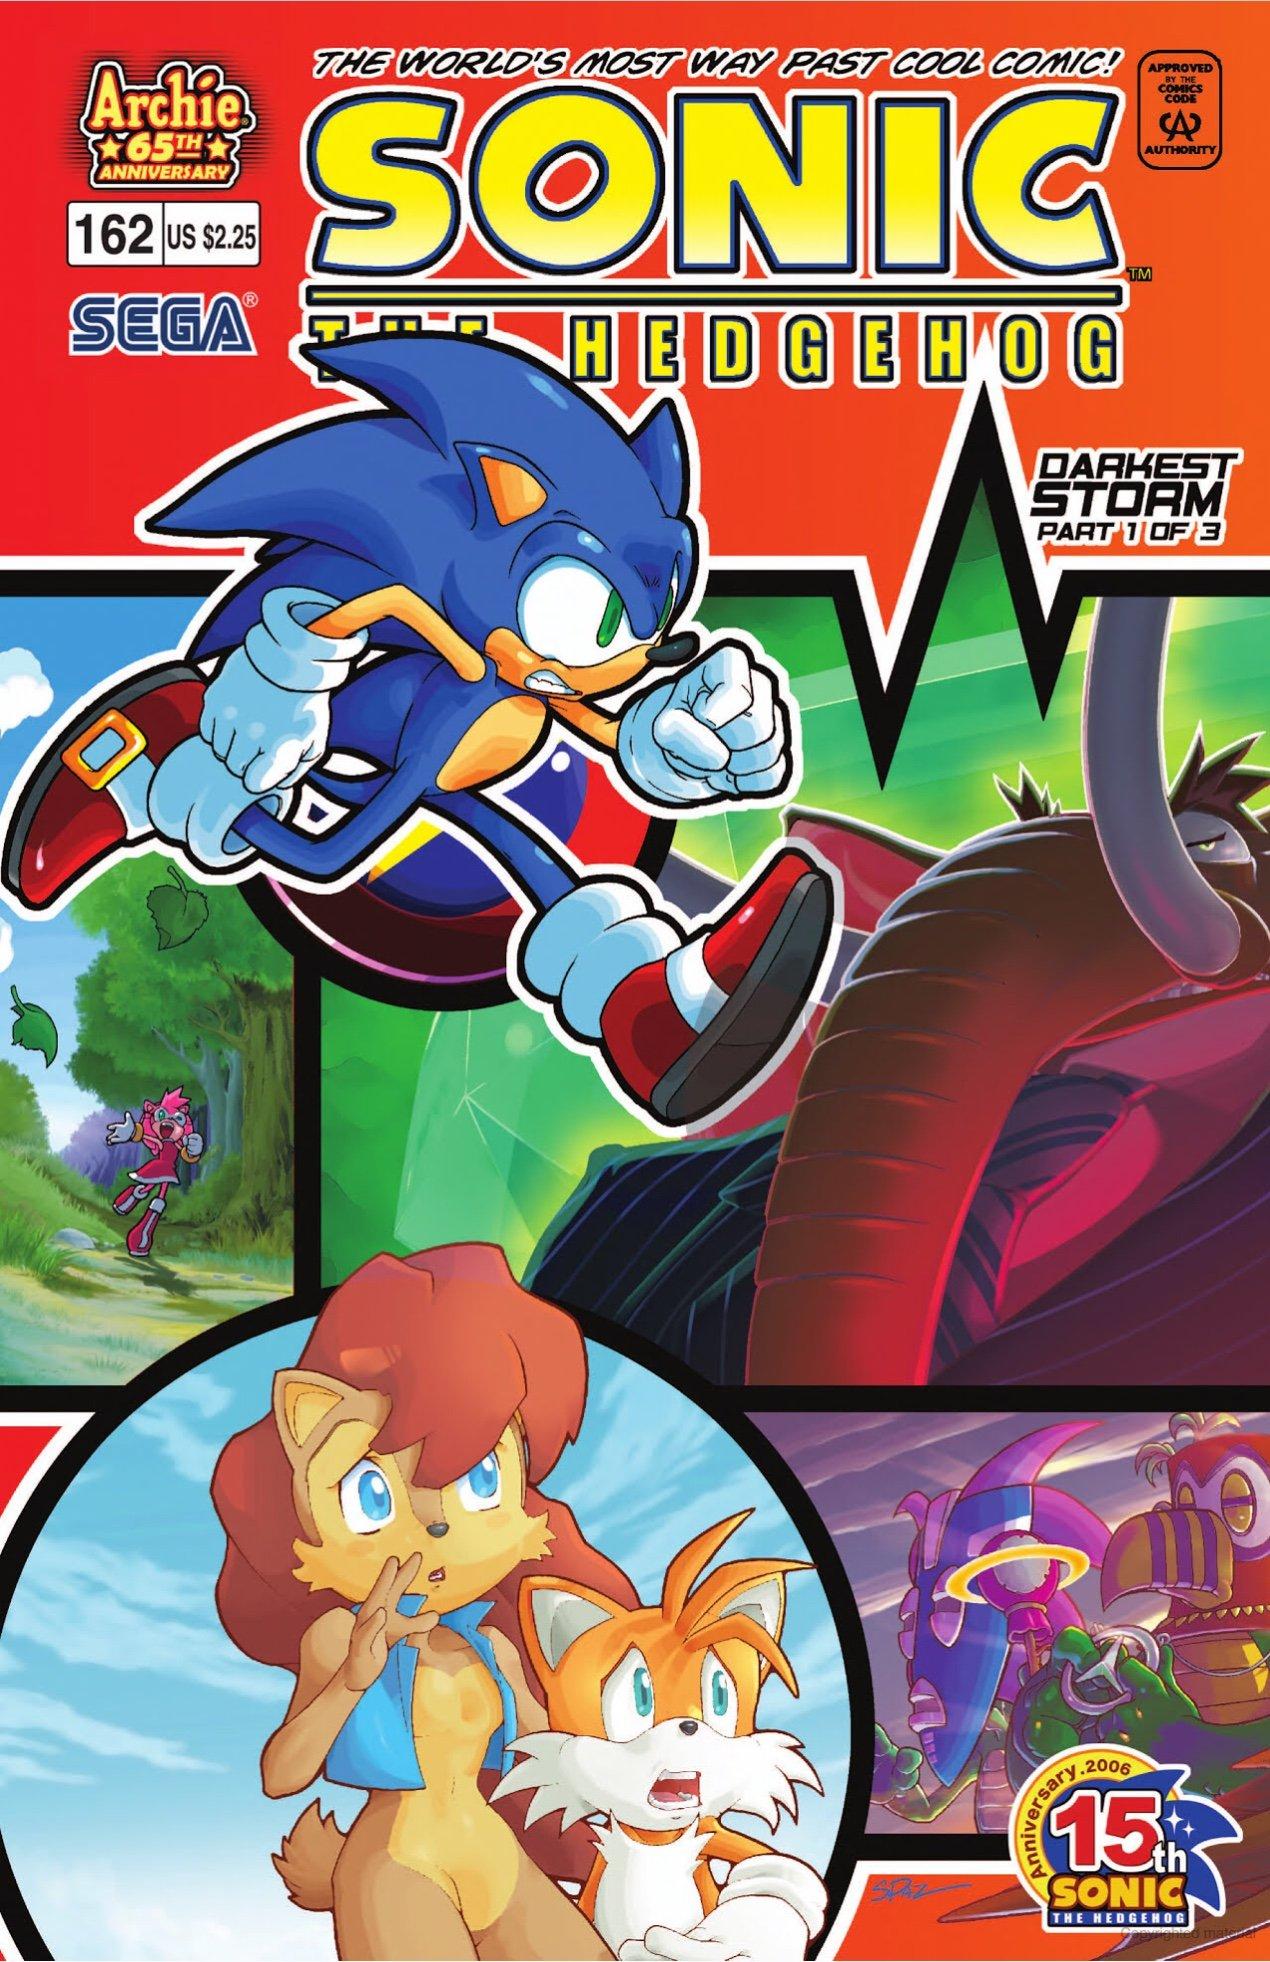 Sonic the Hedgehog 162 (July 2006)